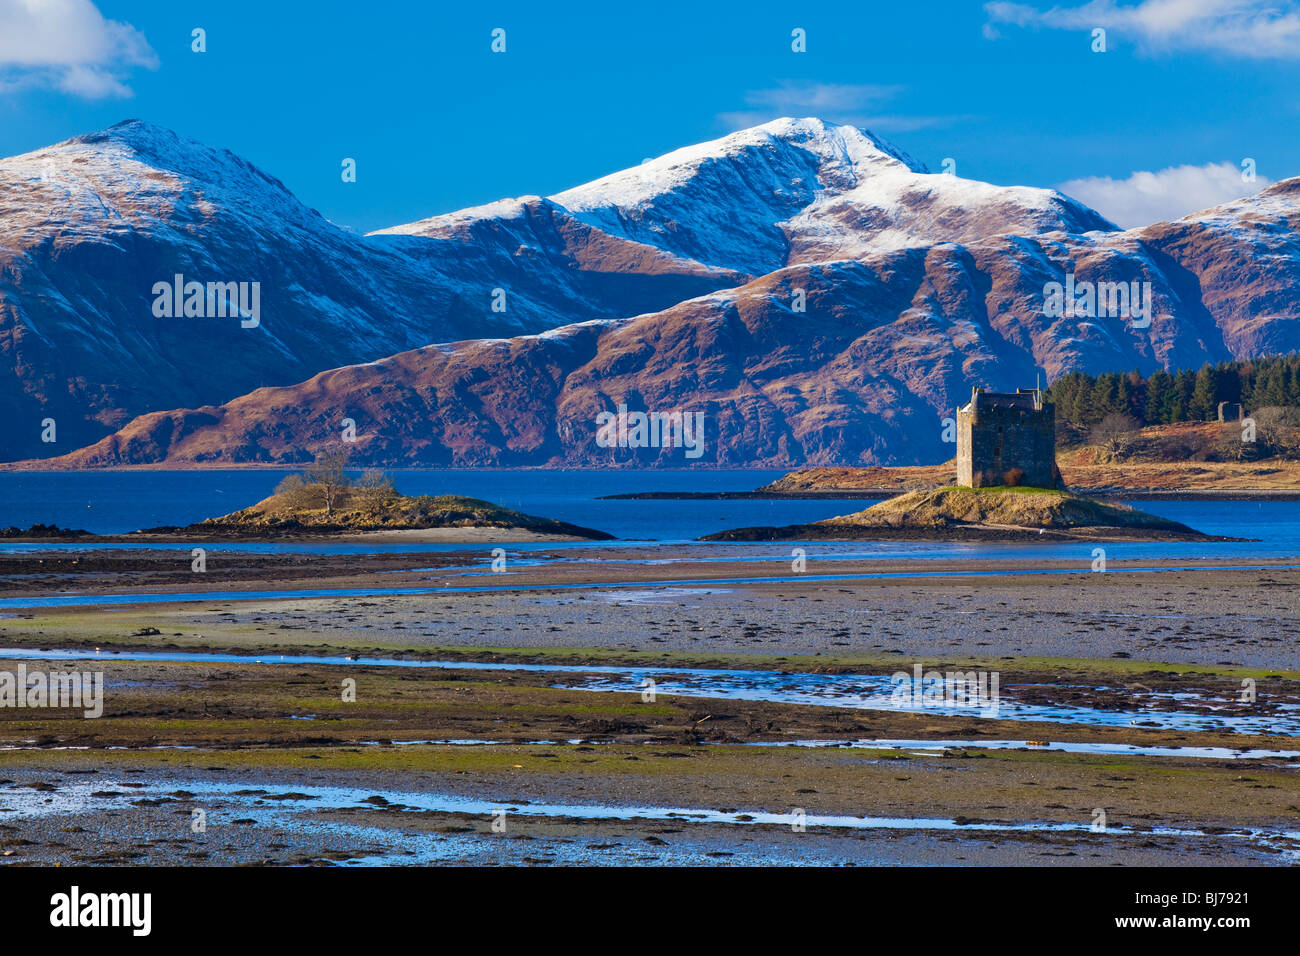 Scotland, Scottish Highlands, Castle Stalker. Castle Stalker near Port Appin is a four story Tower House - Stock Image